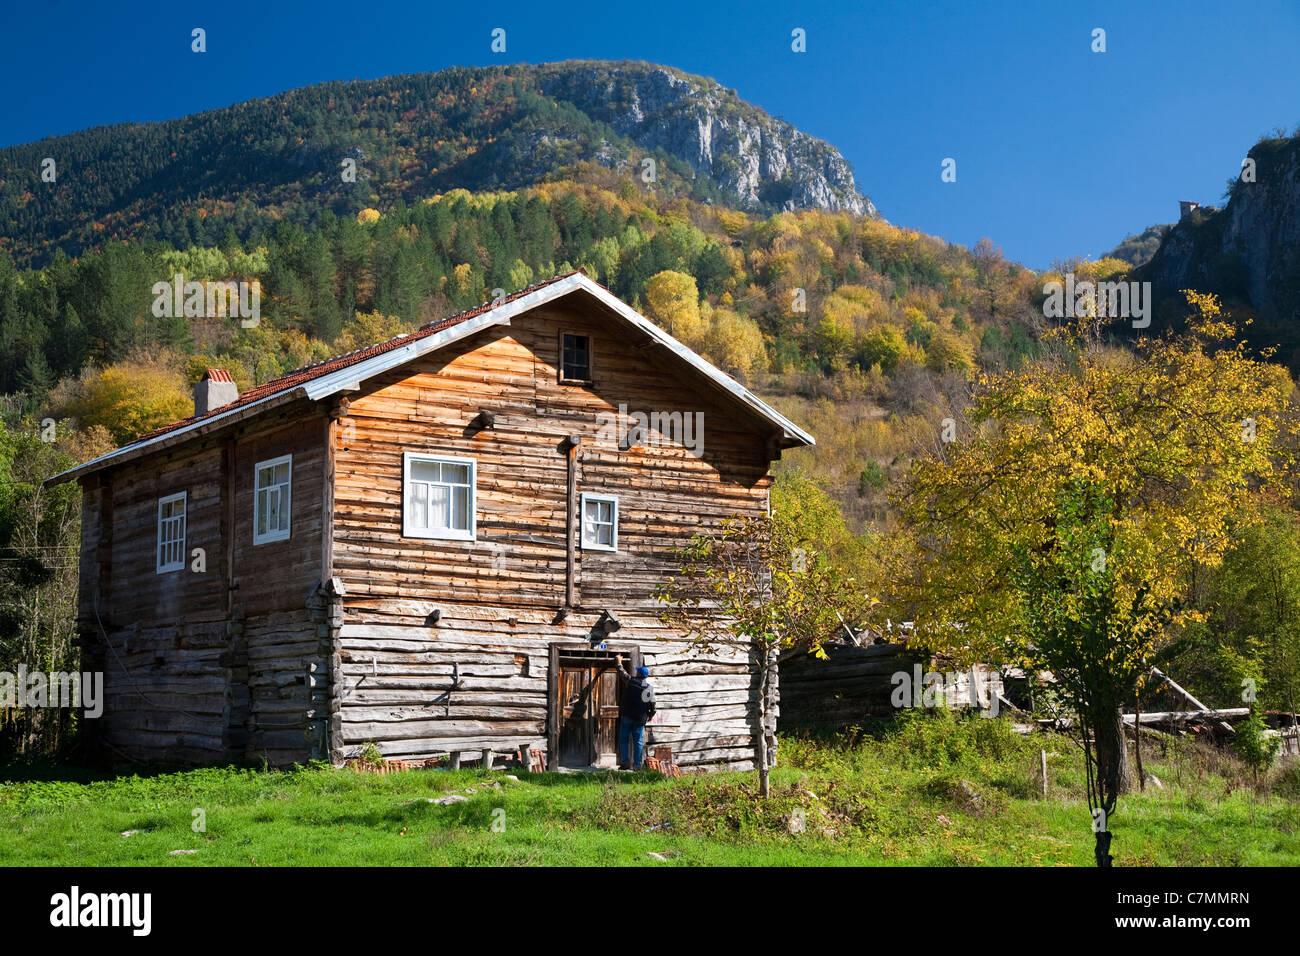 Holzhaus in Kure Berge Kastamonu Azdavay Türkei Stockbild